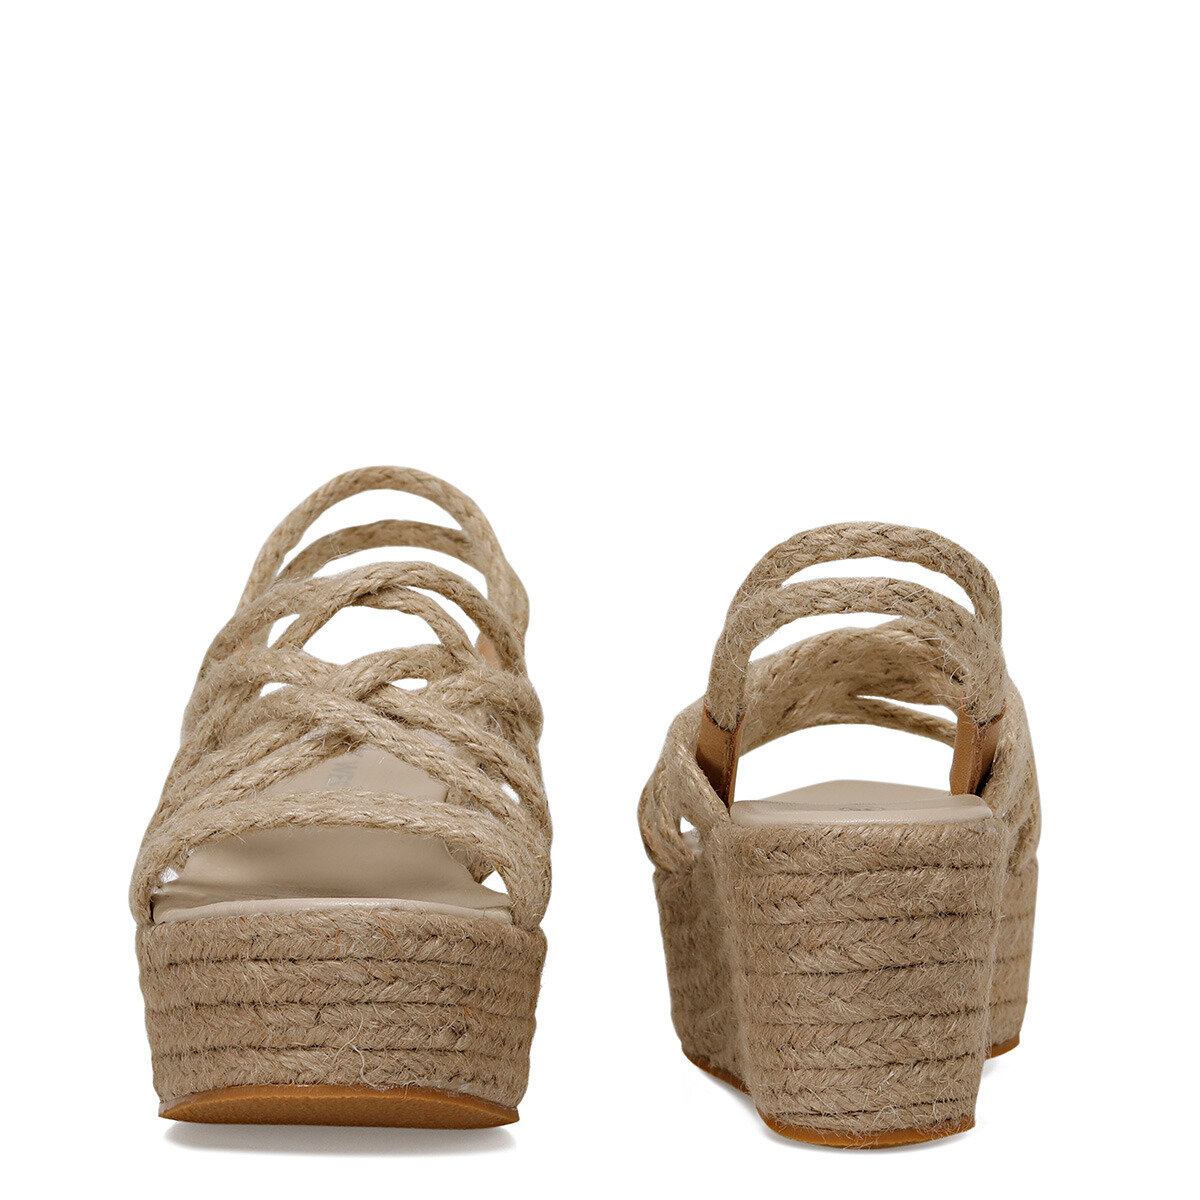 GEORGIA Naturel Kadın Dolgu Topuklu Sandalet